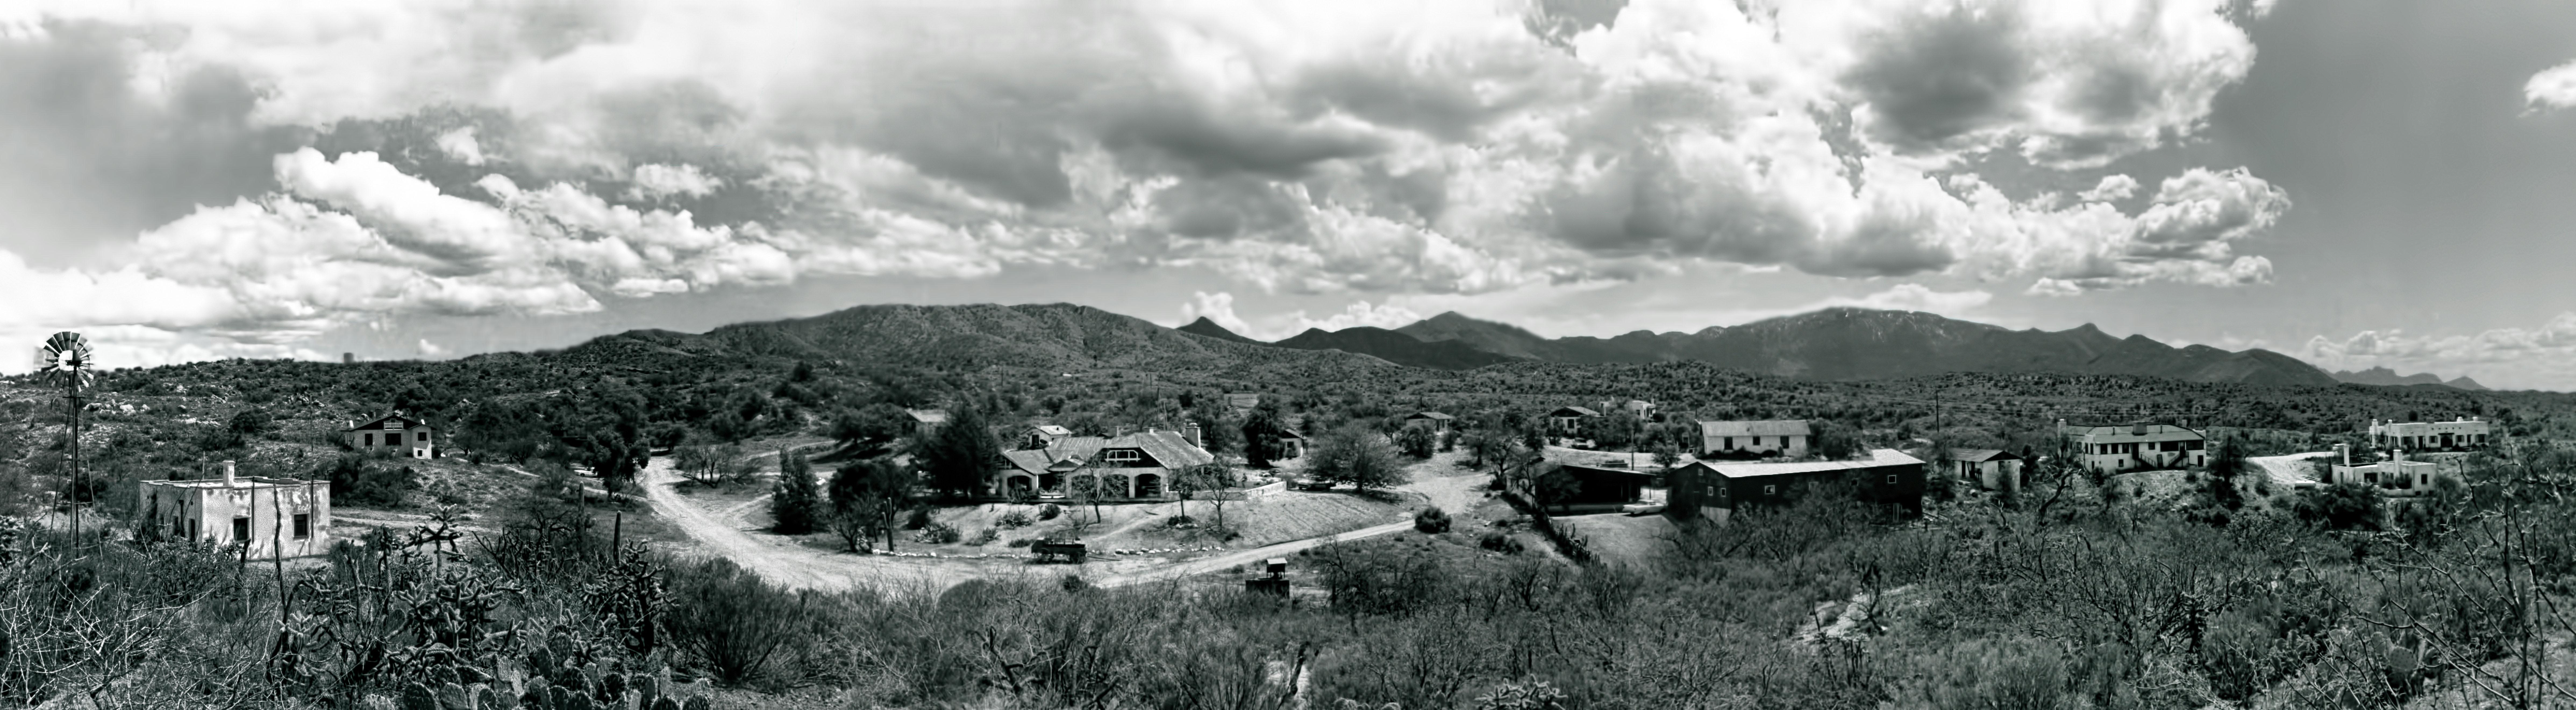 rancho linda vista wide unsized